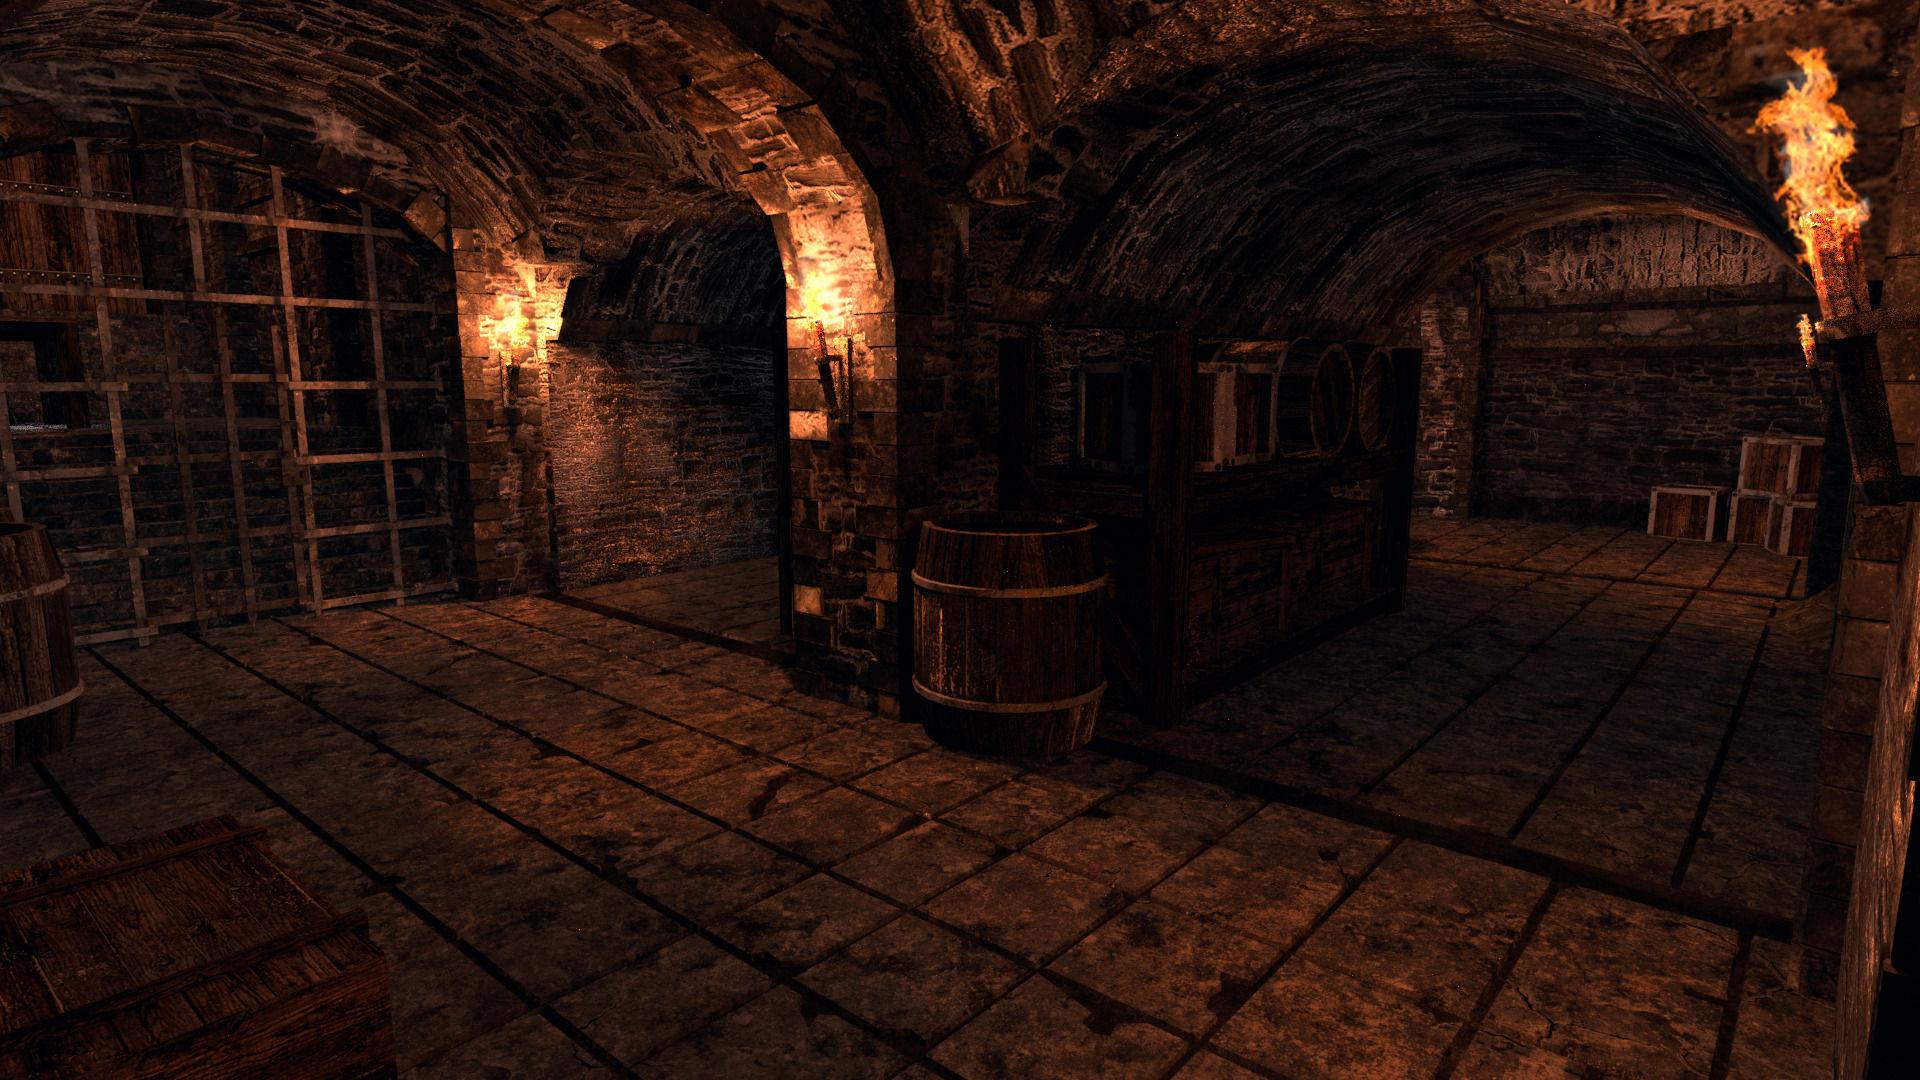 Medieval torture dungeon video free fucking girlfriends